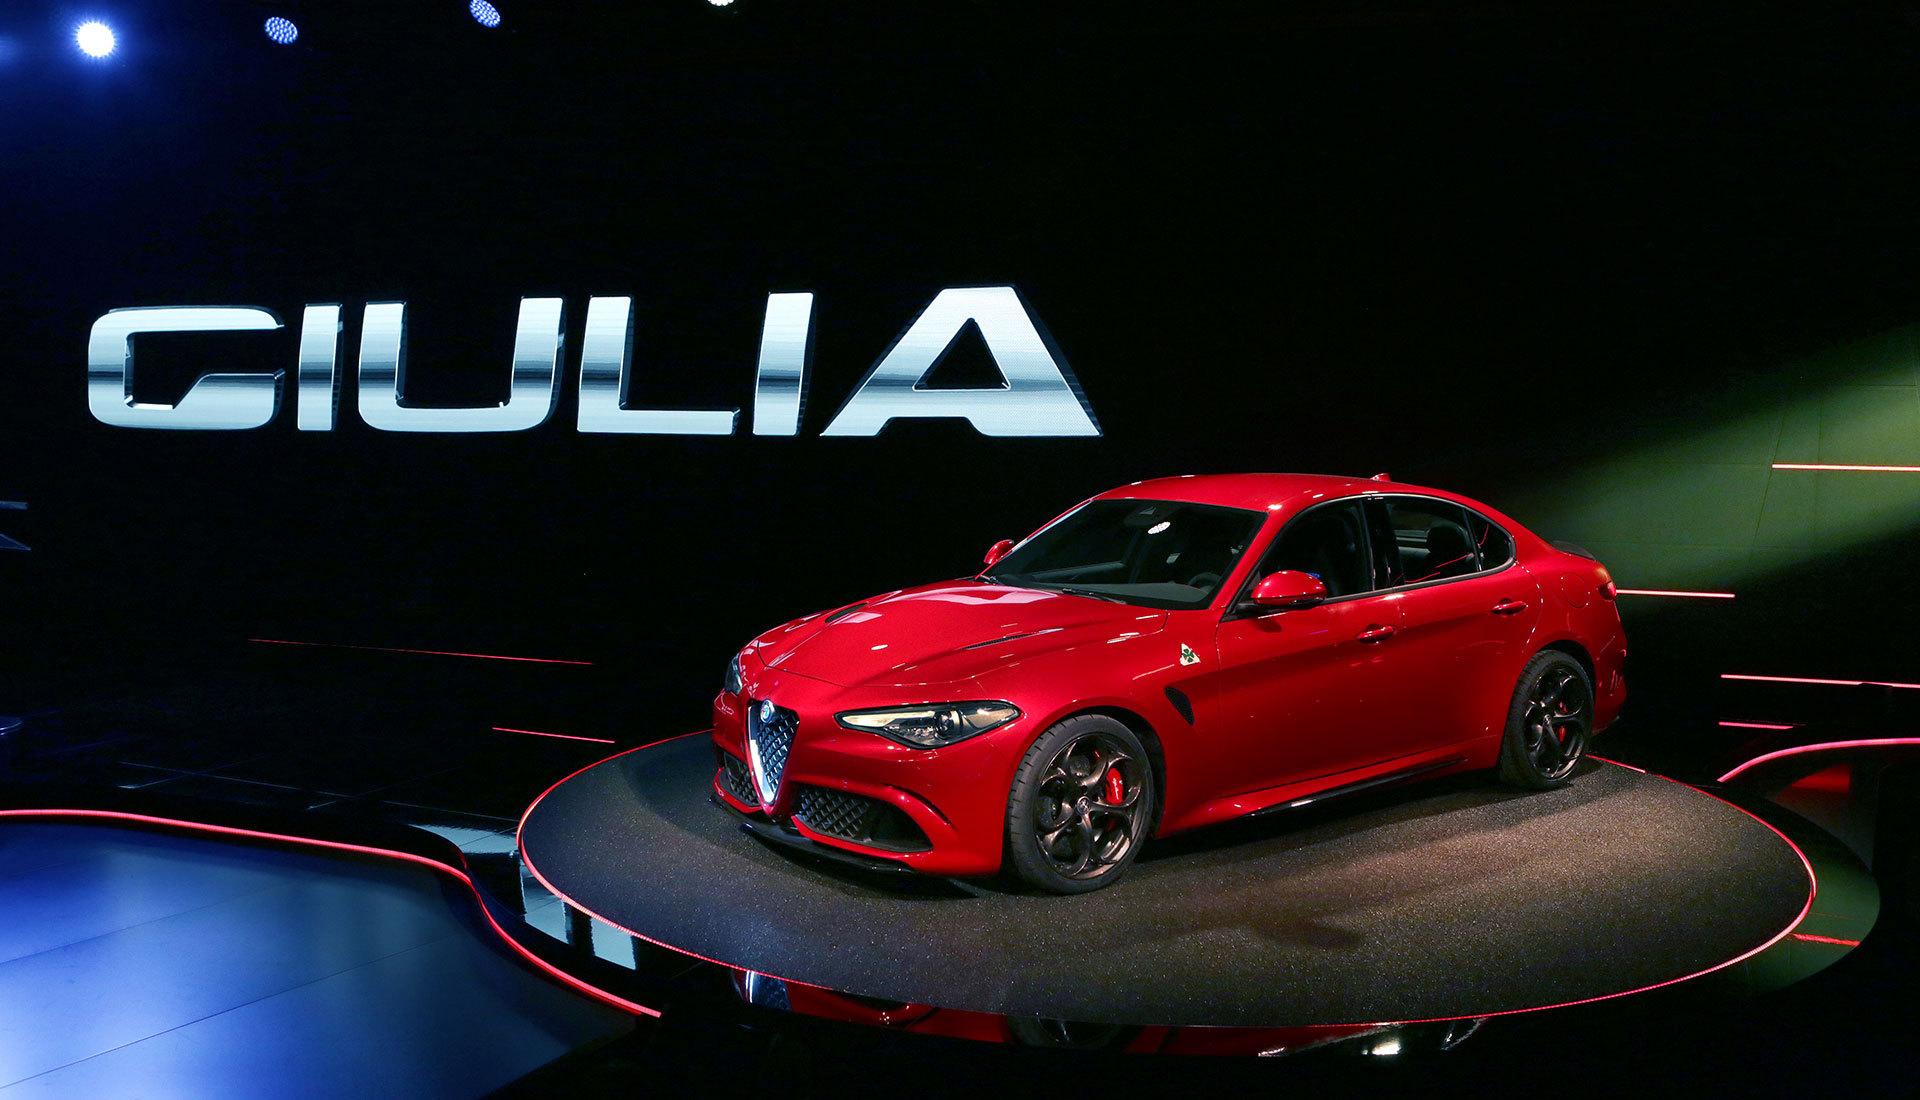 Alfa Romeo Giulia 2015 High Definition Wallpapers